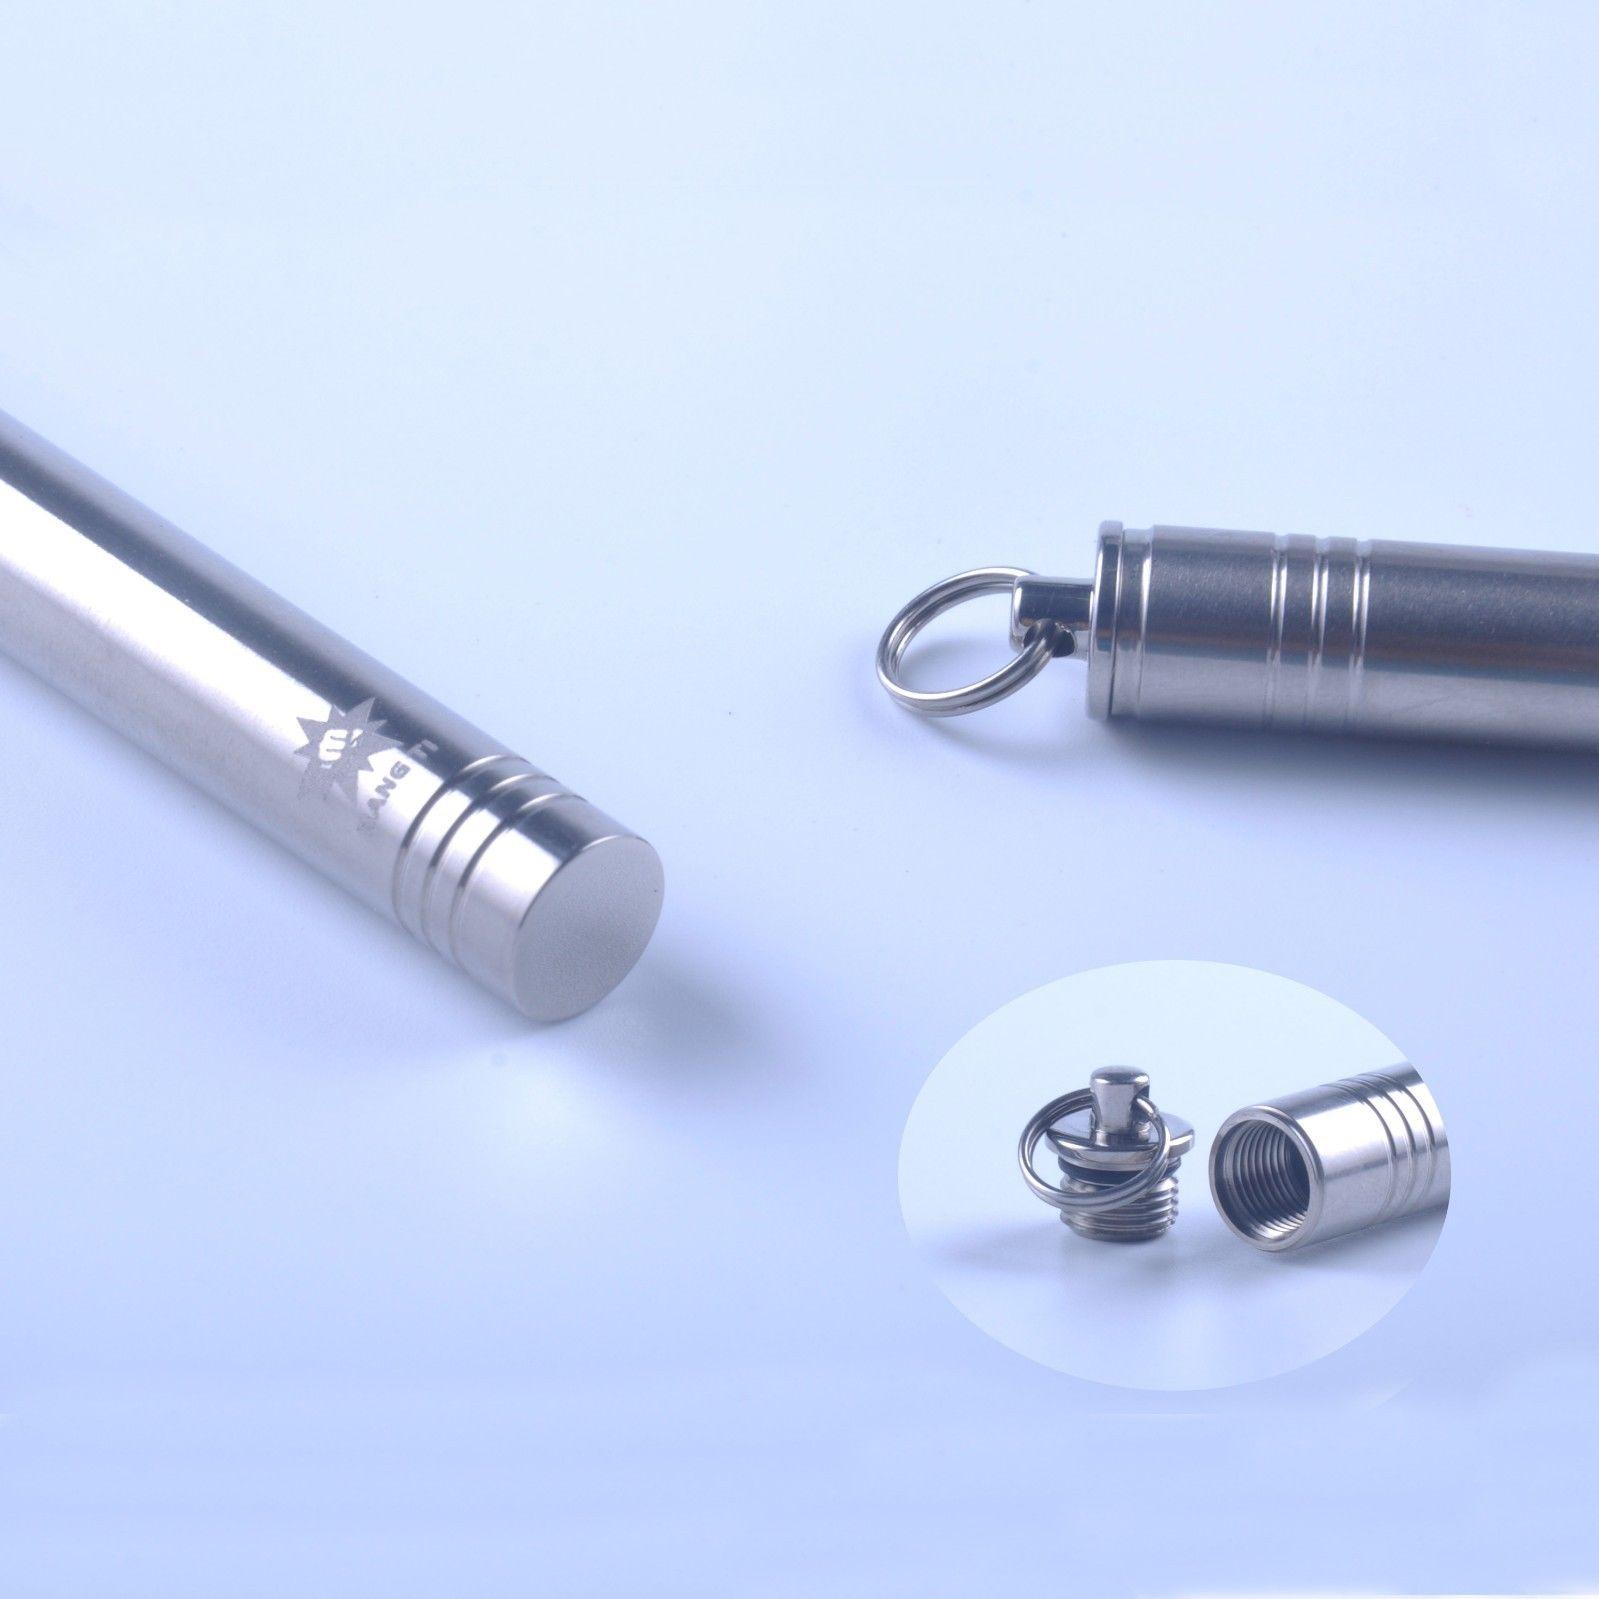 Titanium pocket toothpick holder container outdoor keychain keyring gift ebay - Toothpick holder pocket ...